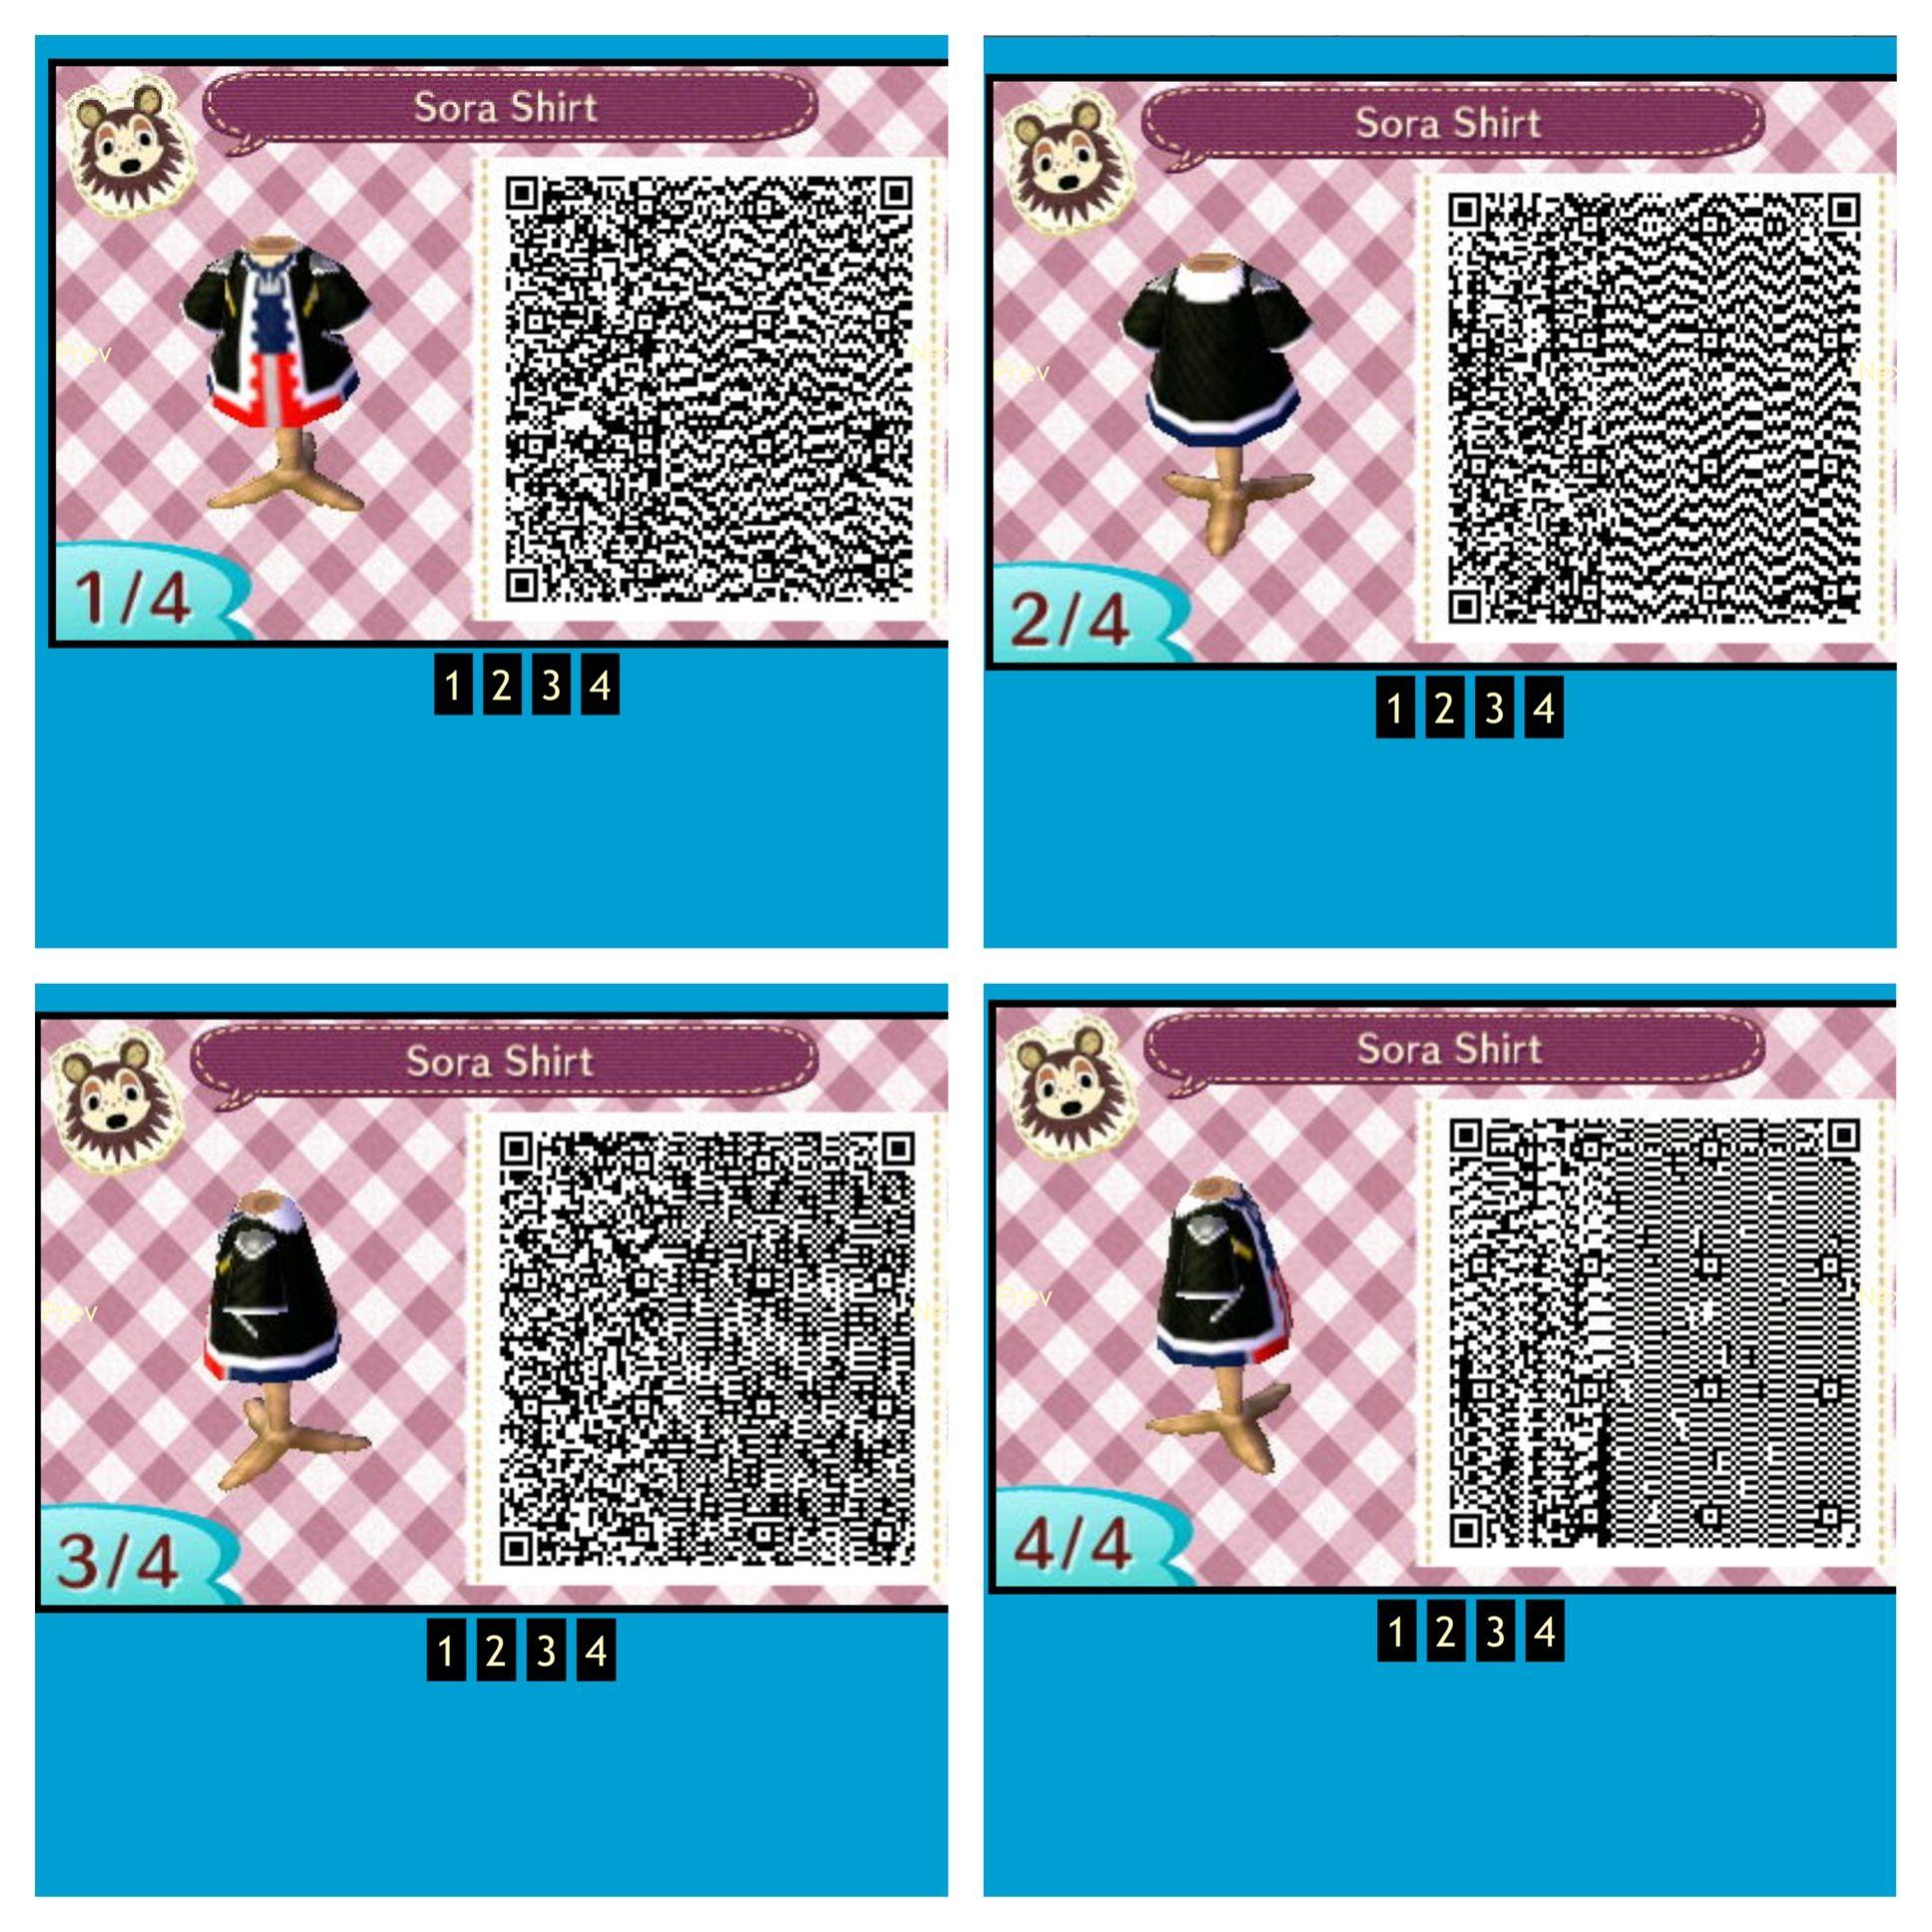 Animal Crossing New Leaf Qr Code Sora Shirt Animal Crossing Qr